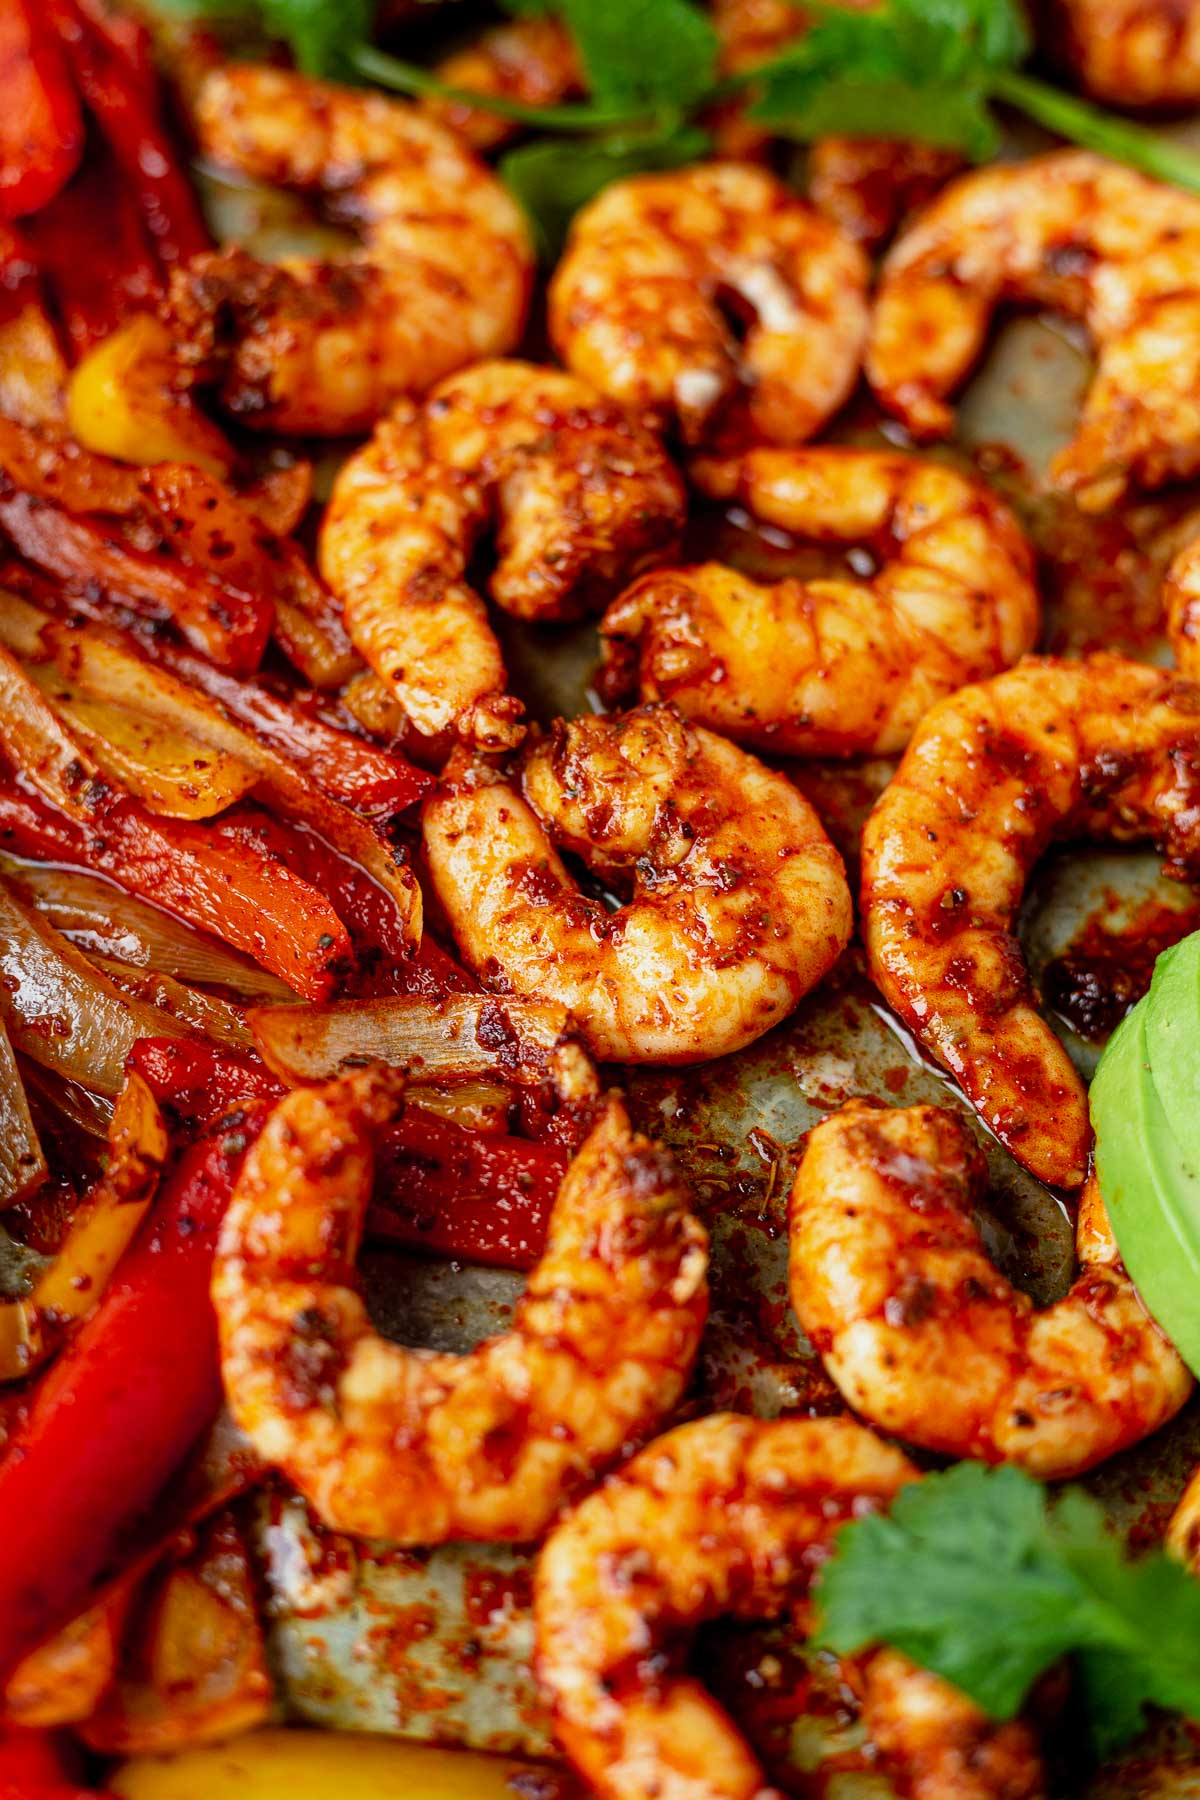 shrimp fajitas cooked on a sheet pan with fresh cilantro